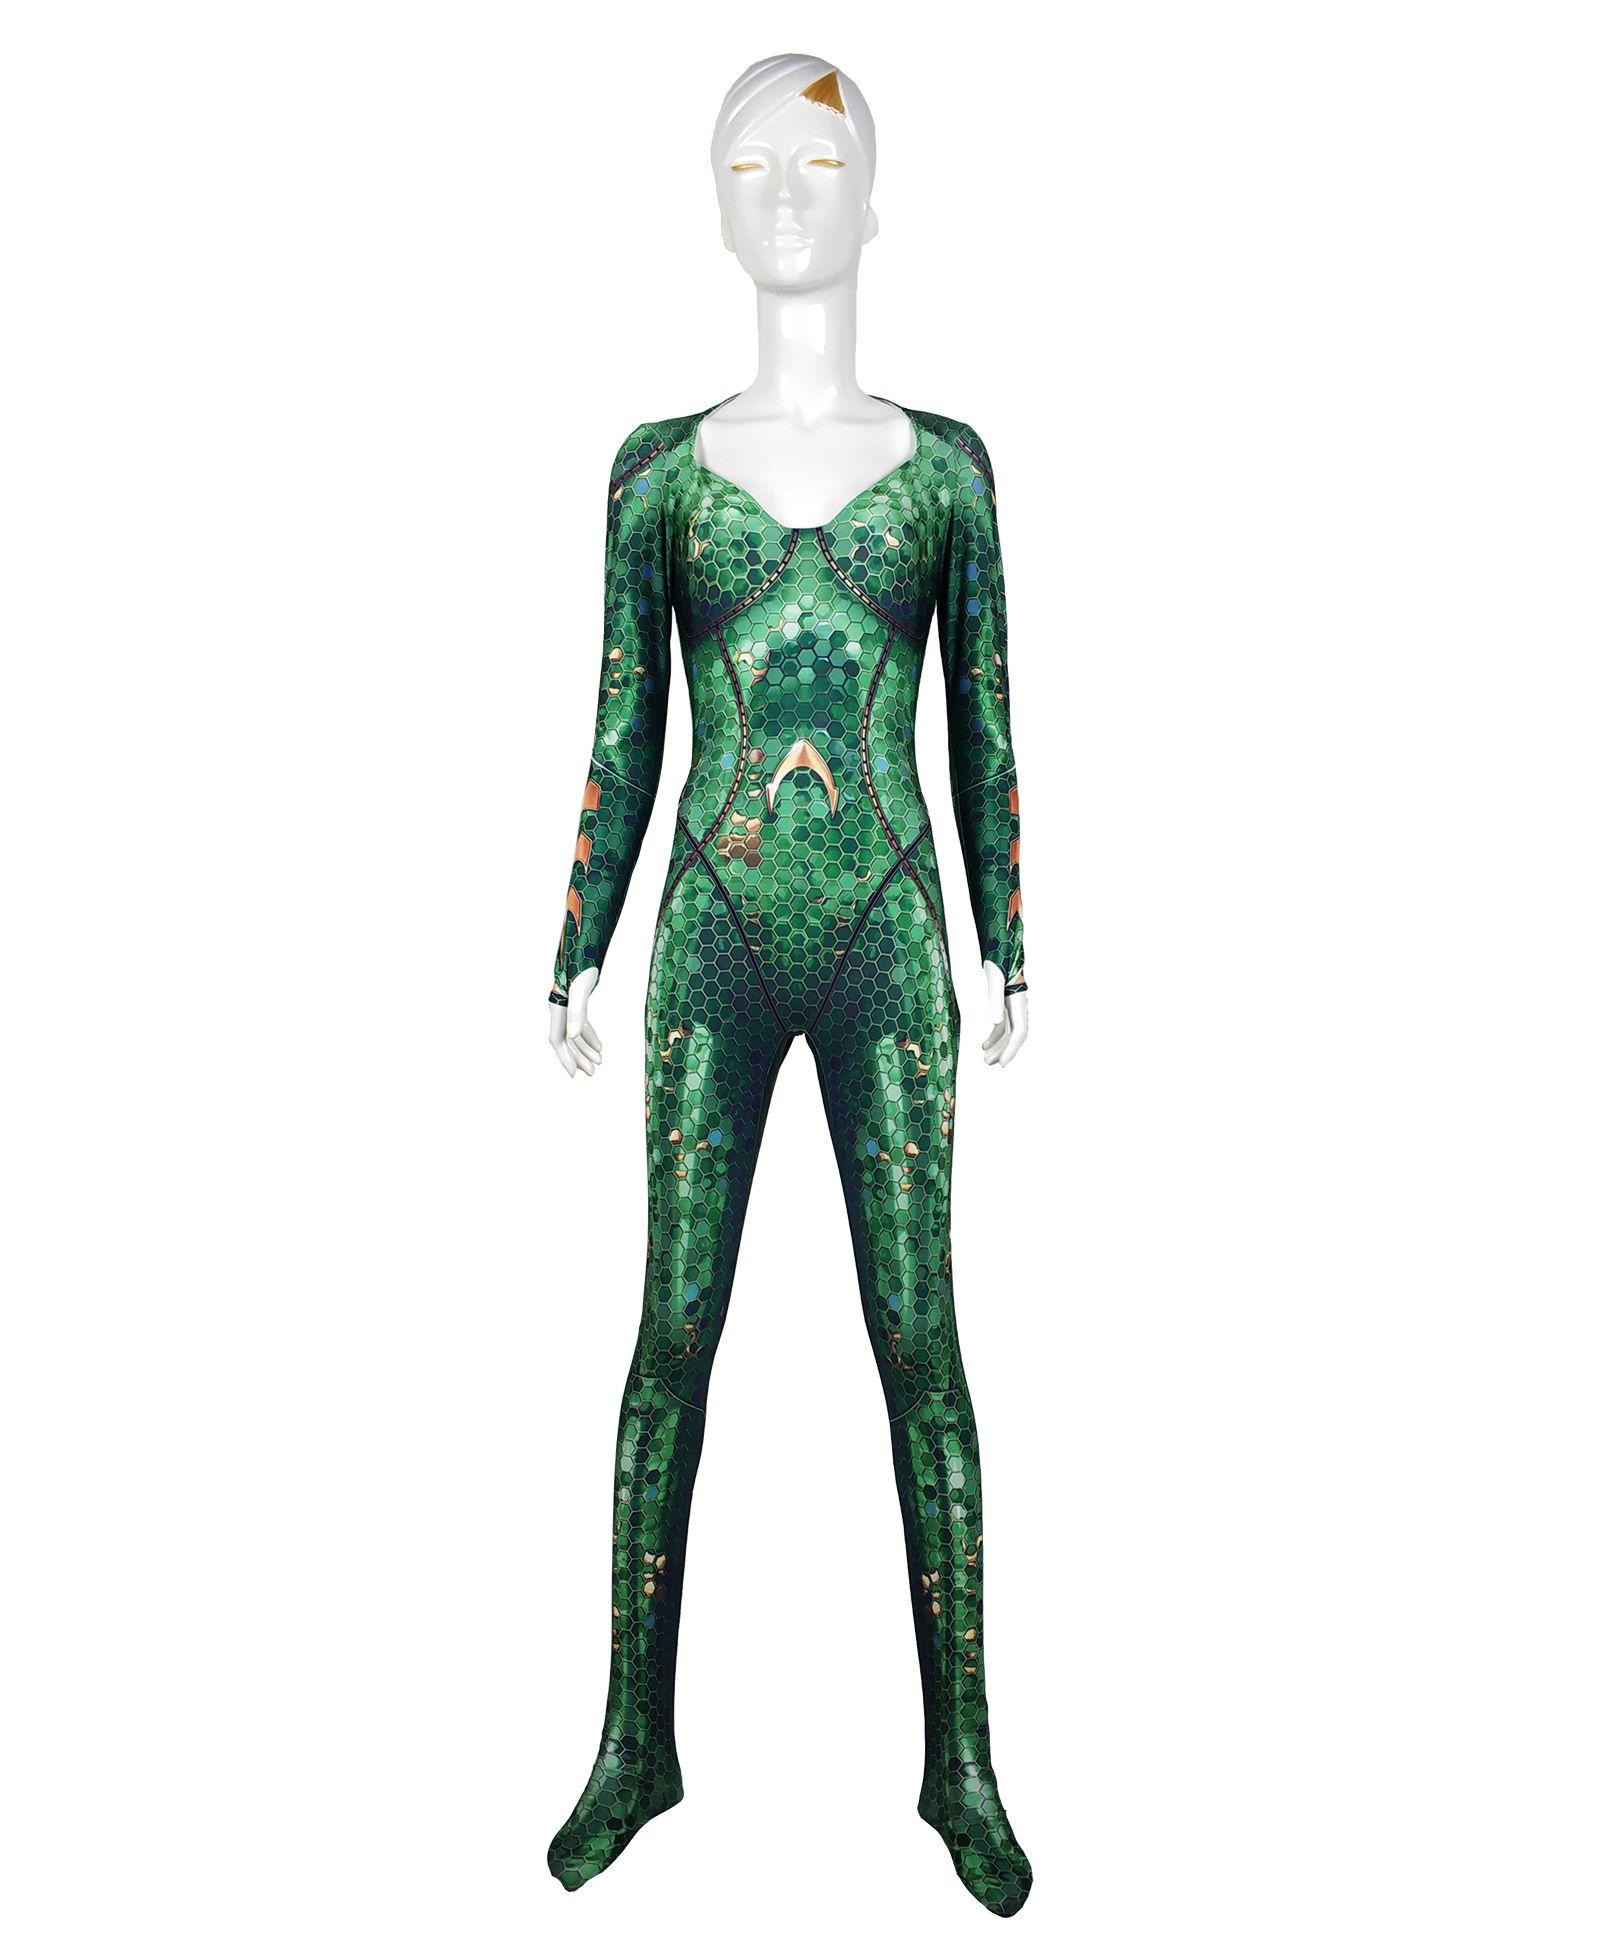 Costume Mera Aquaman Version Film Mera Cosplay Body 3D Imprimer Costume Lycra Spandex Zentai Halloween costume